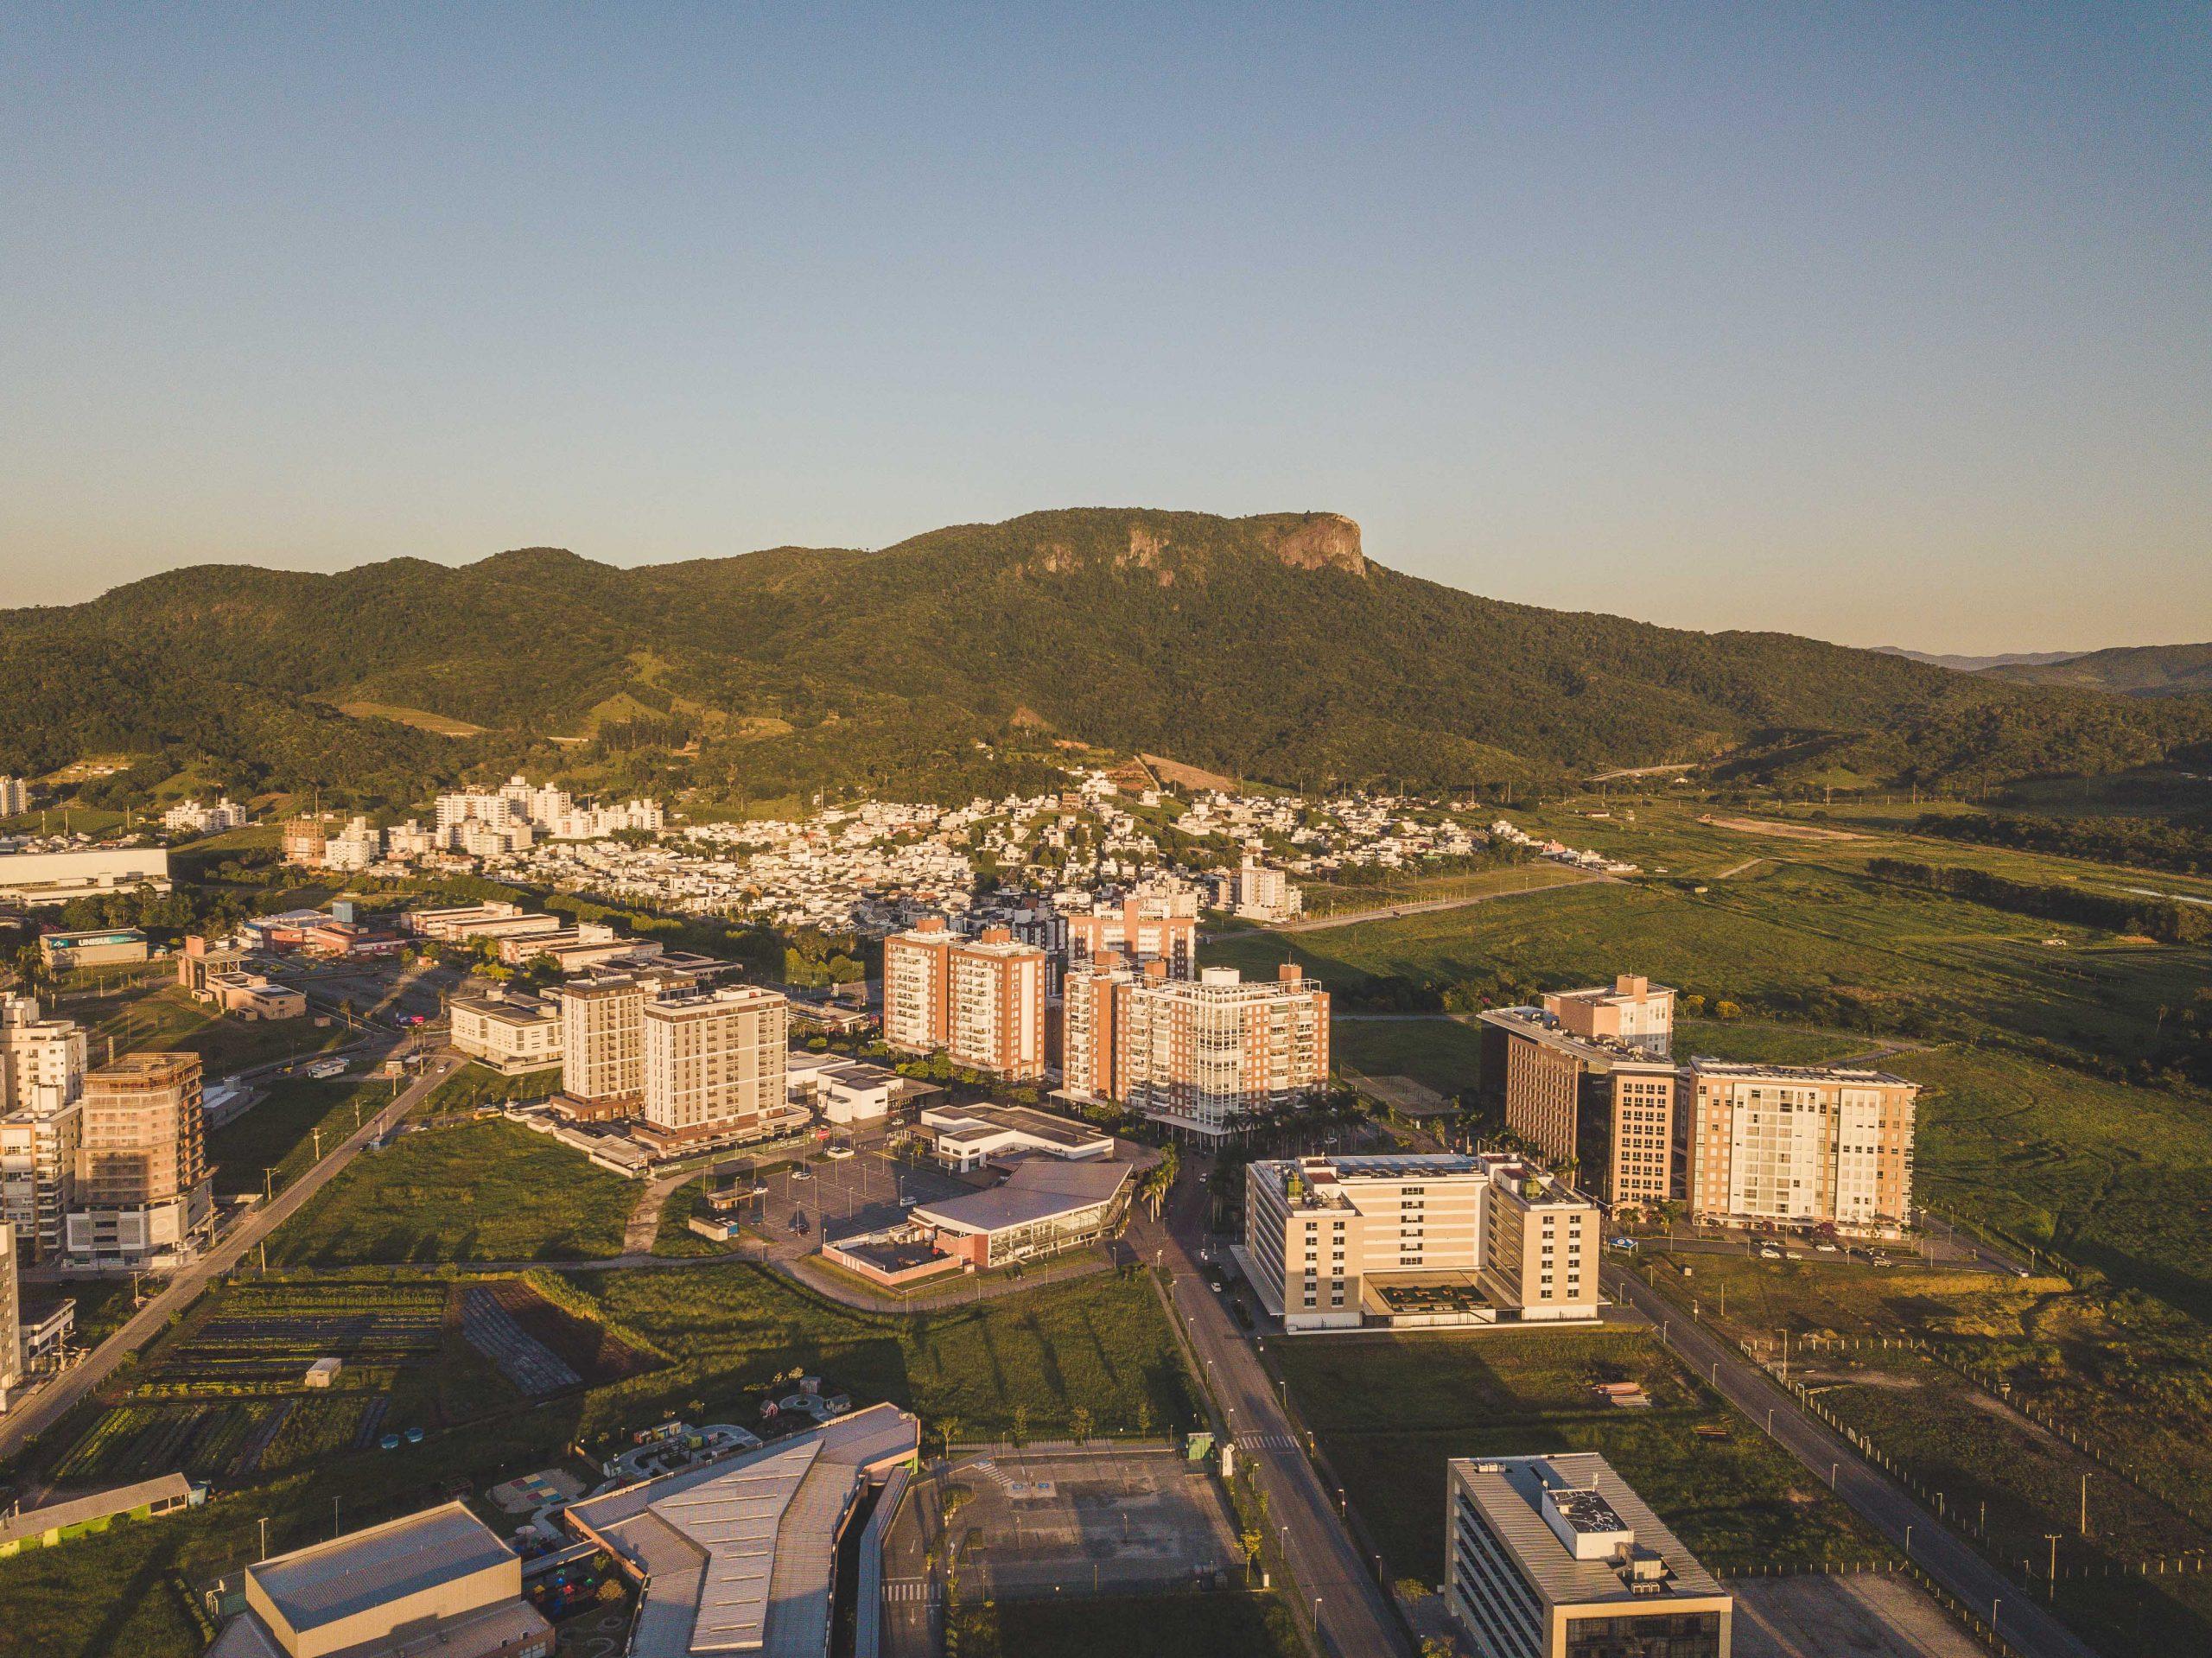 A tecnologia e o crescimento do conceito de Cidade Inteligente